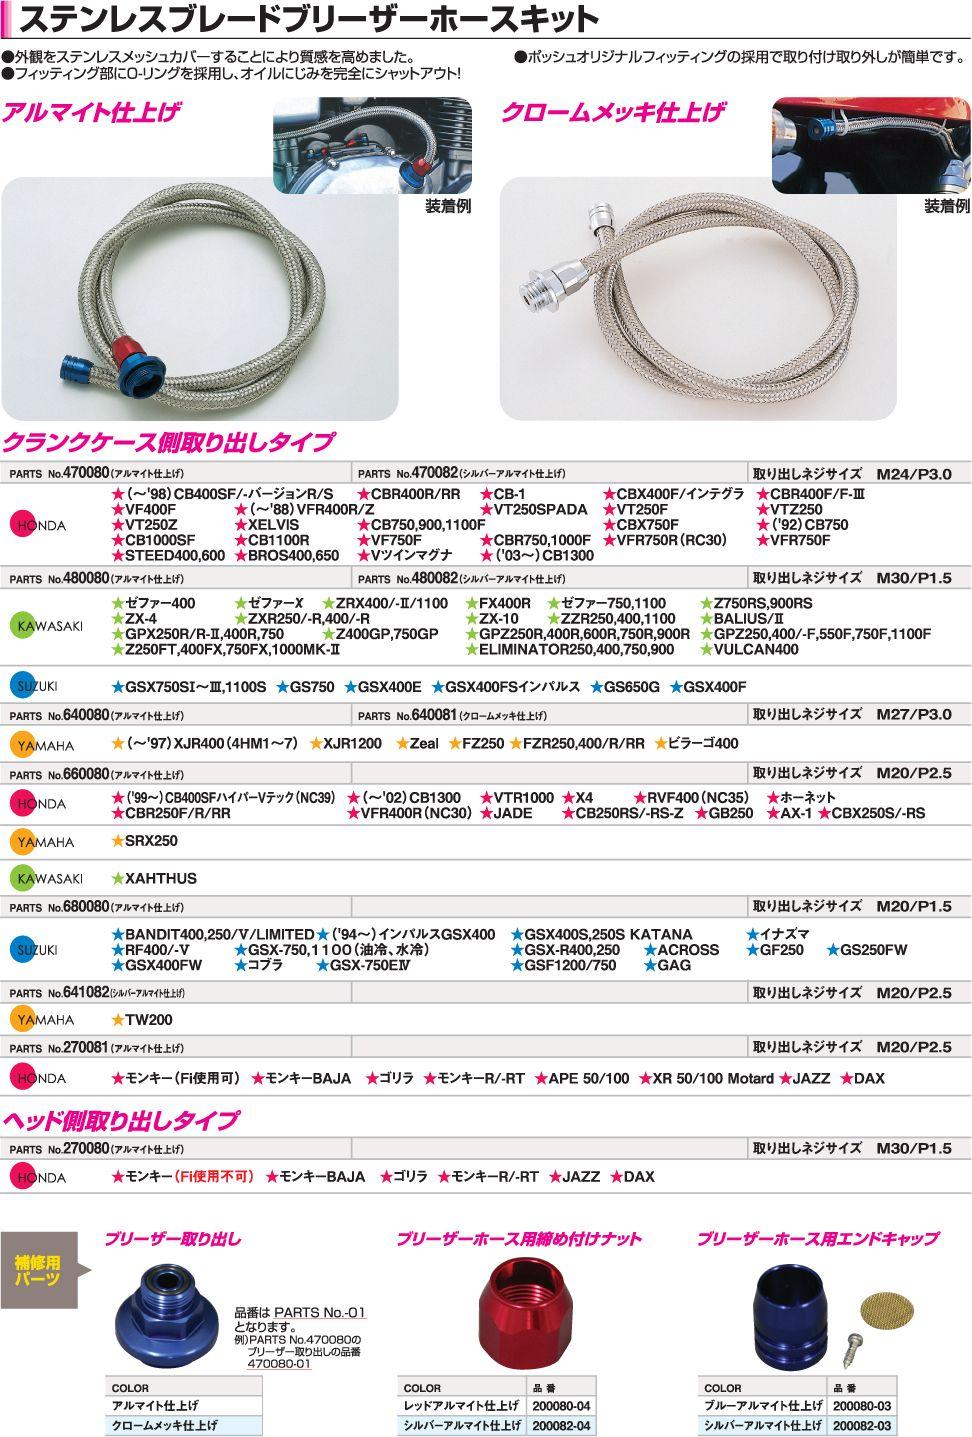 【CF POSH】Blade 不銹鋼通氣軟管套件 - 「Webike-摩托百貨」